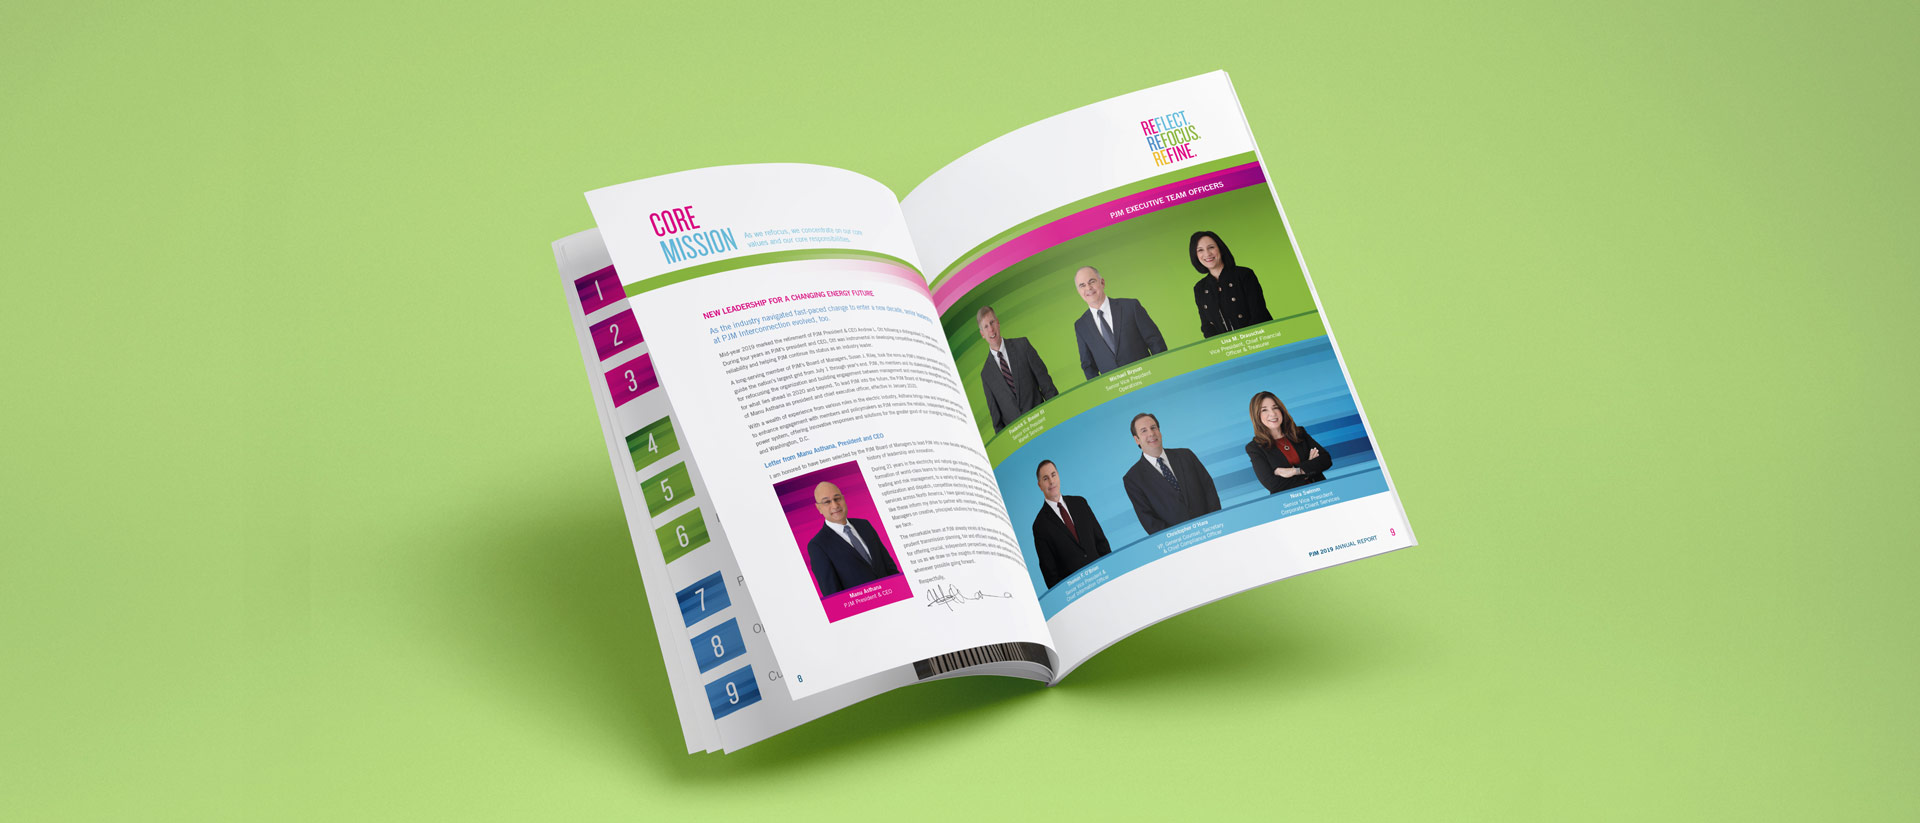 Annual Report Design for PJM